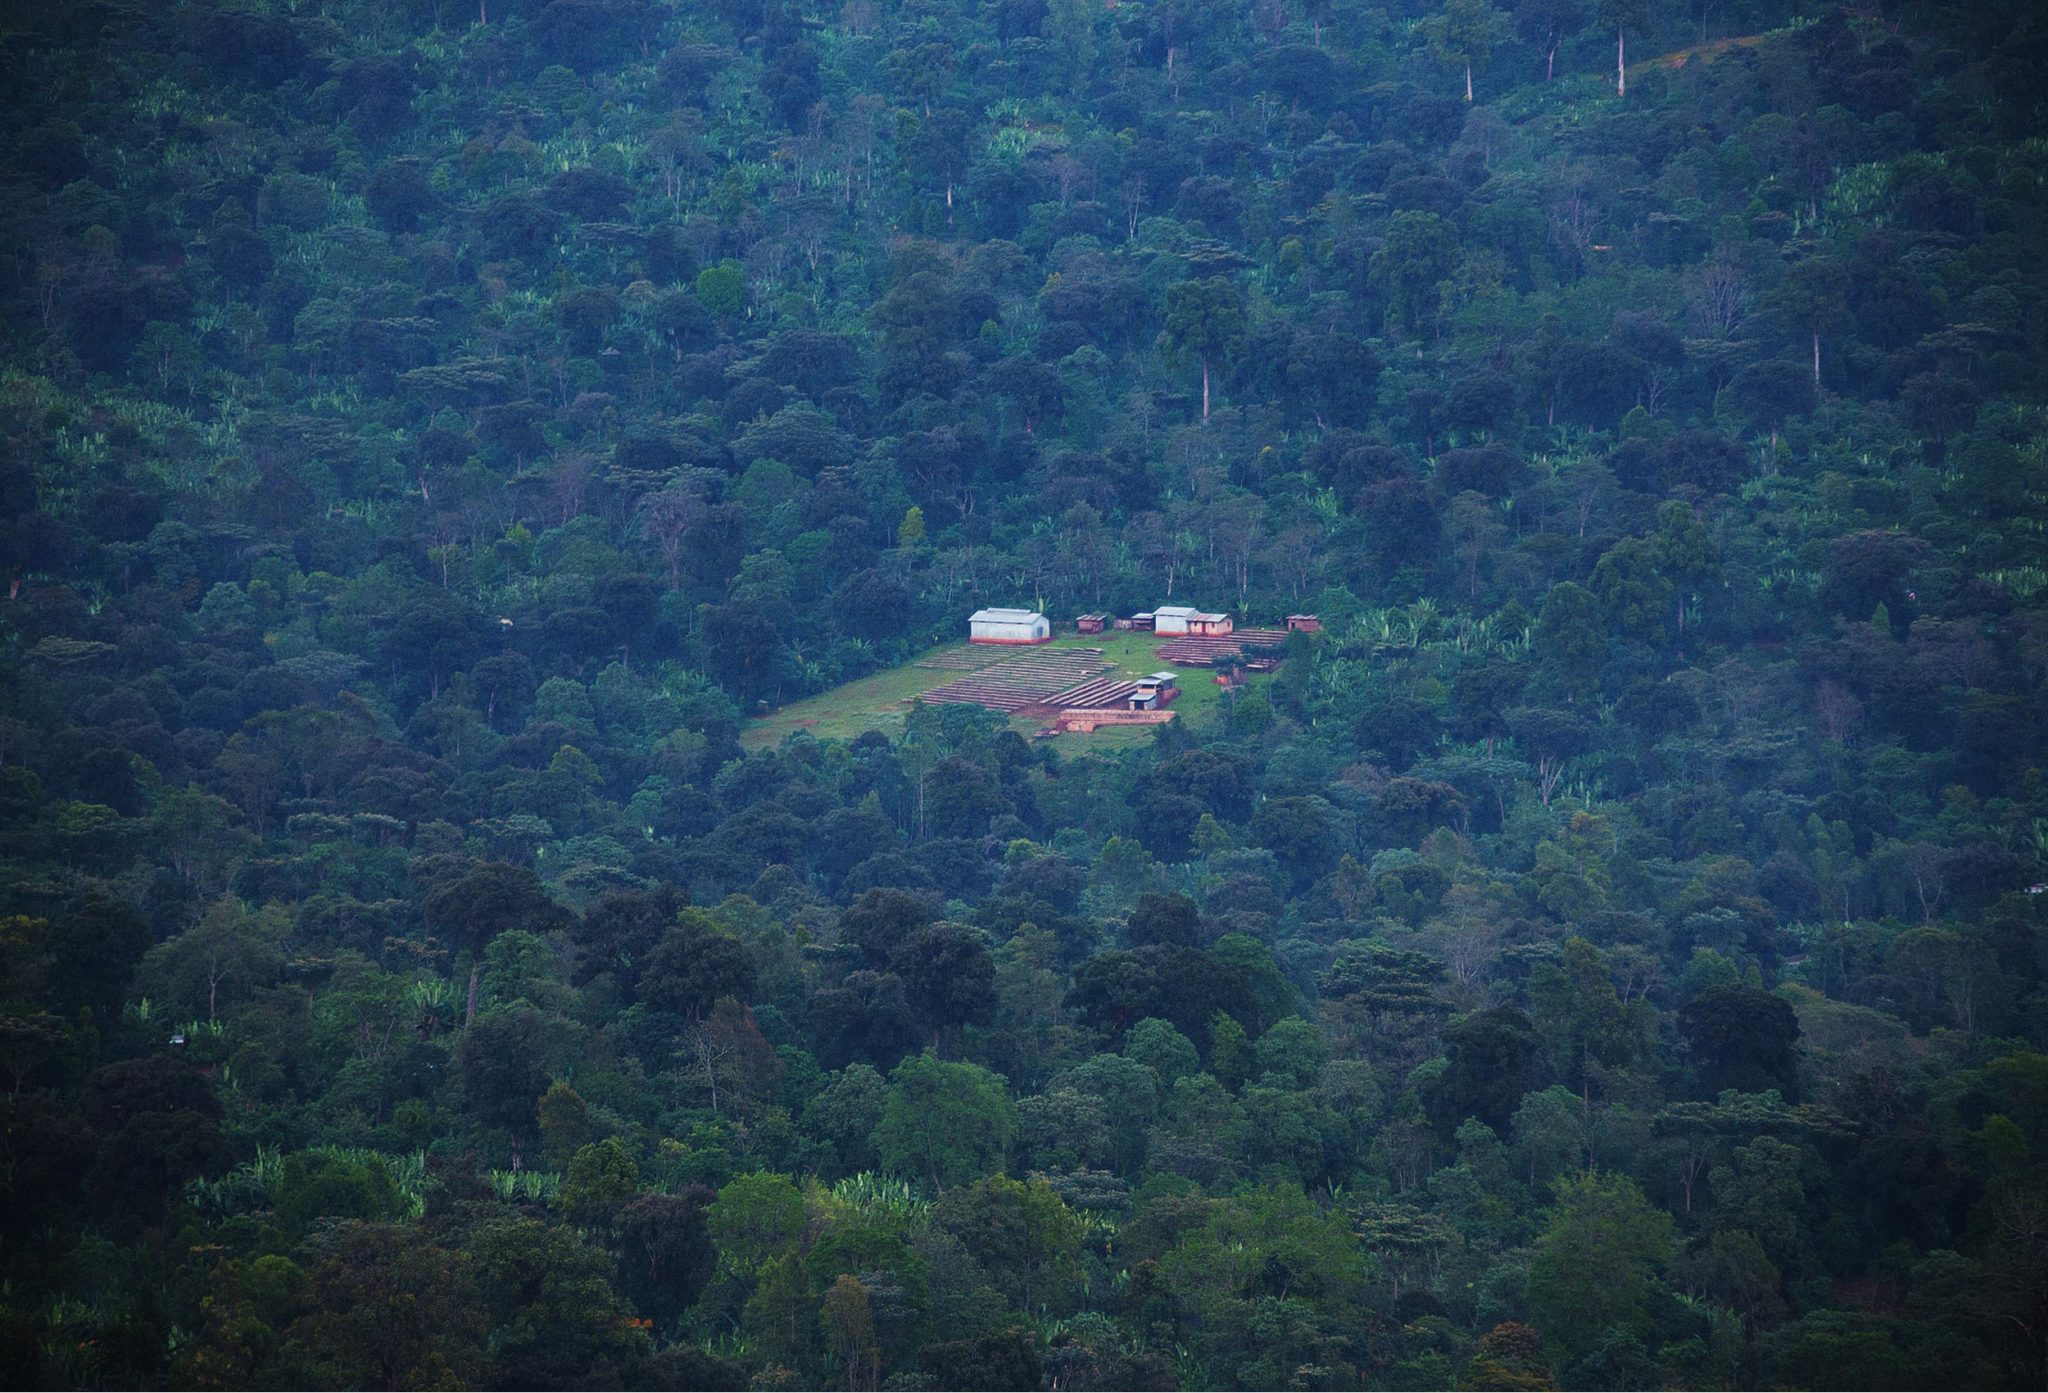 coffee farm in gedeo ethiopia